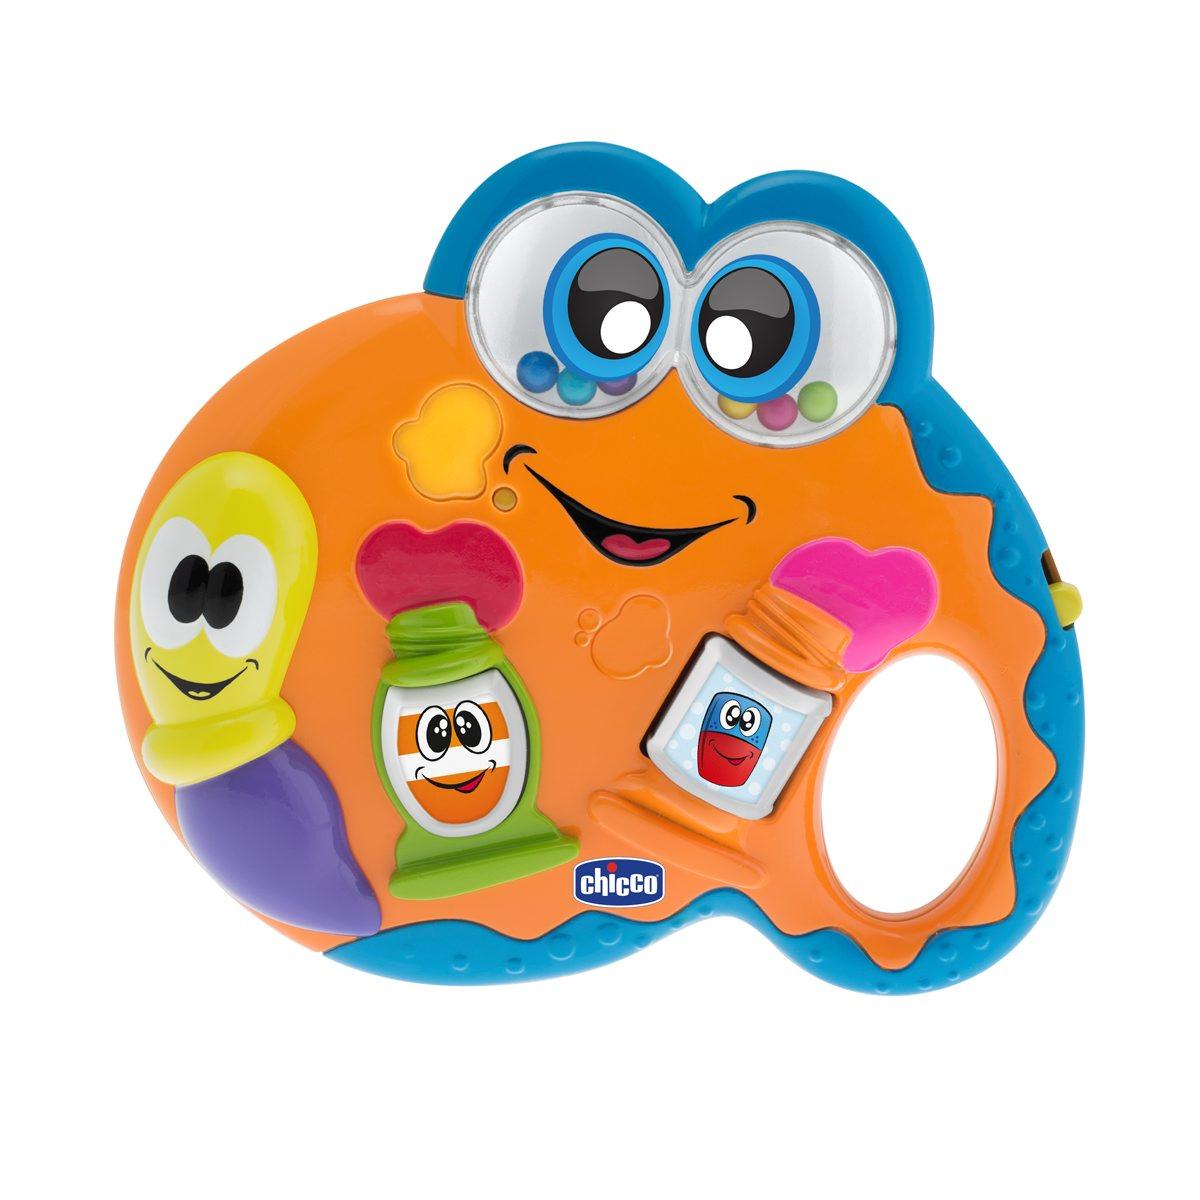 Chicco Музыкальная игрушка Палитра00007701000000